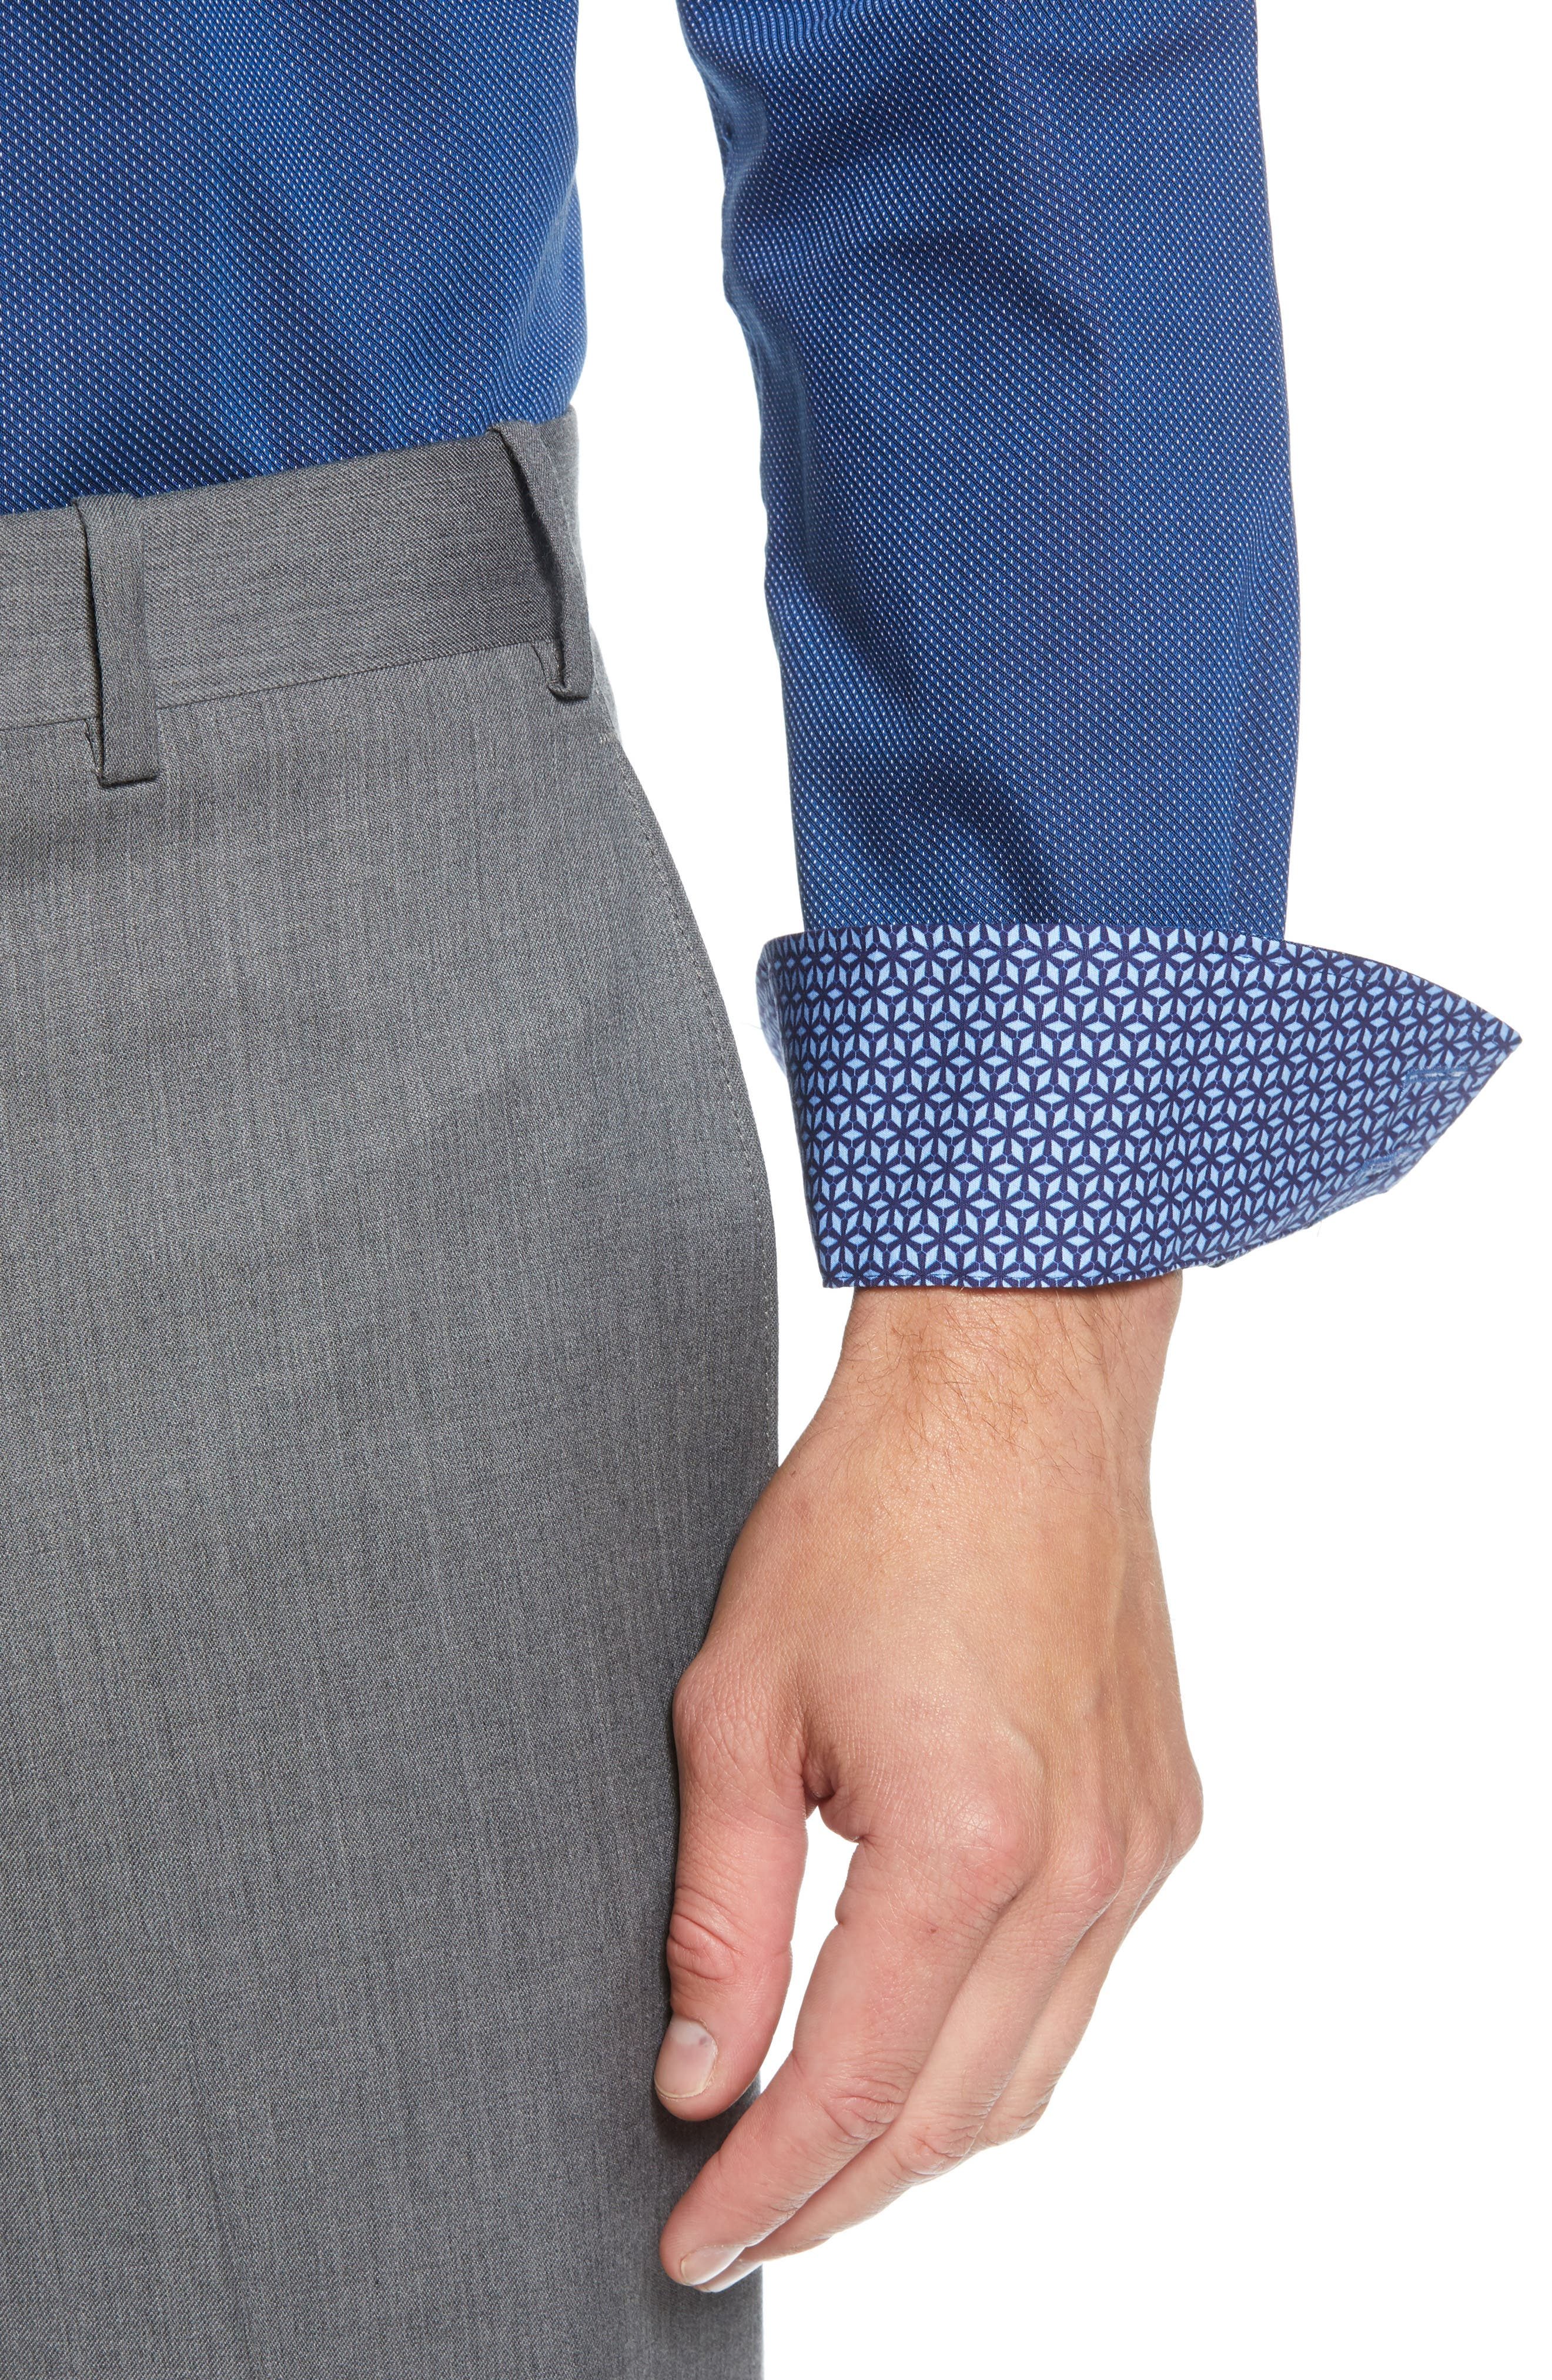 TED BAKER LONDON,                             Wikks Slim Fit Print Dress Shirt,                             Alternate thumbnail 2, color,                             410